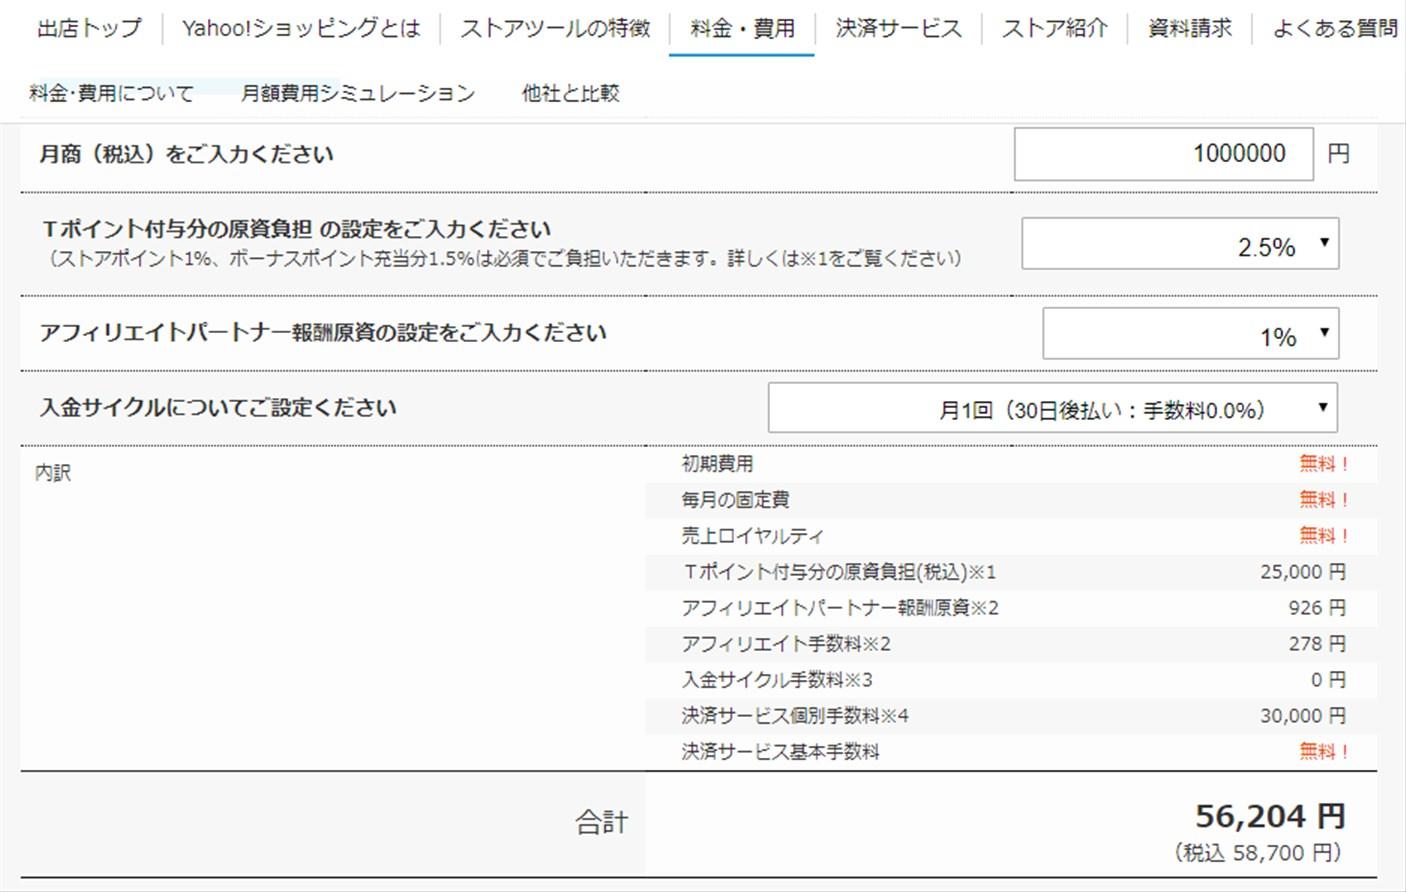 Yahoo!出店コスト (1)